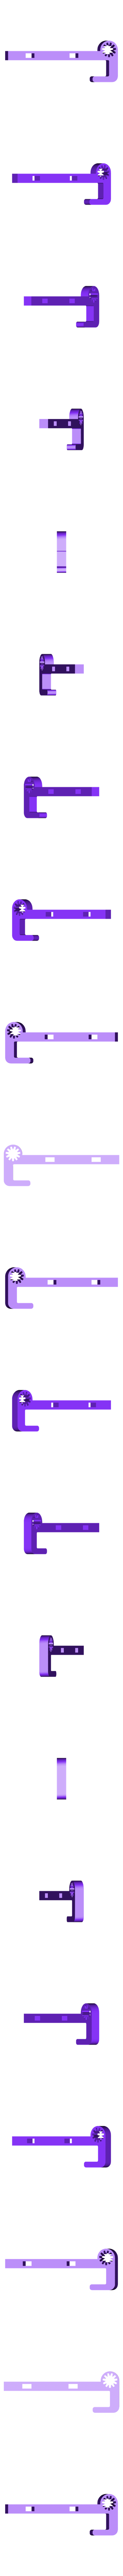 Support tablette LLH F.STL Download free STL file Foldable shelf support • Model to 3D print, LLH